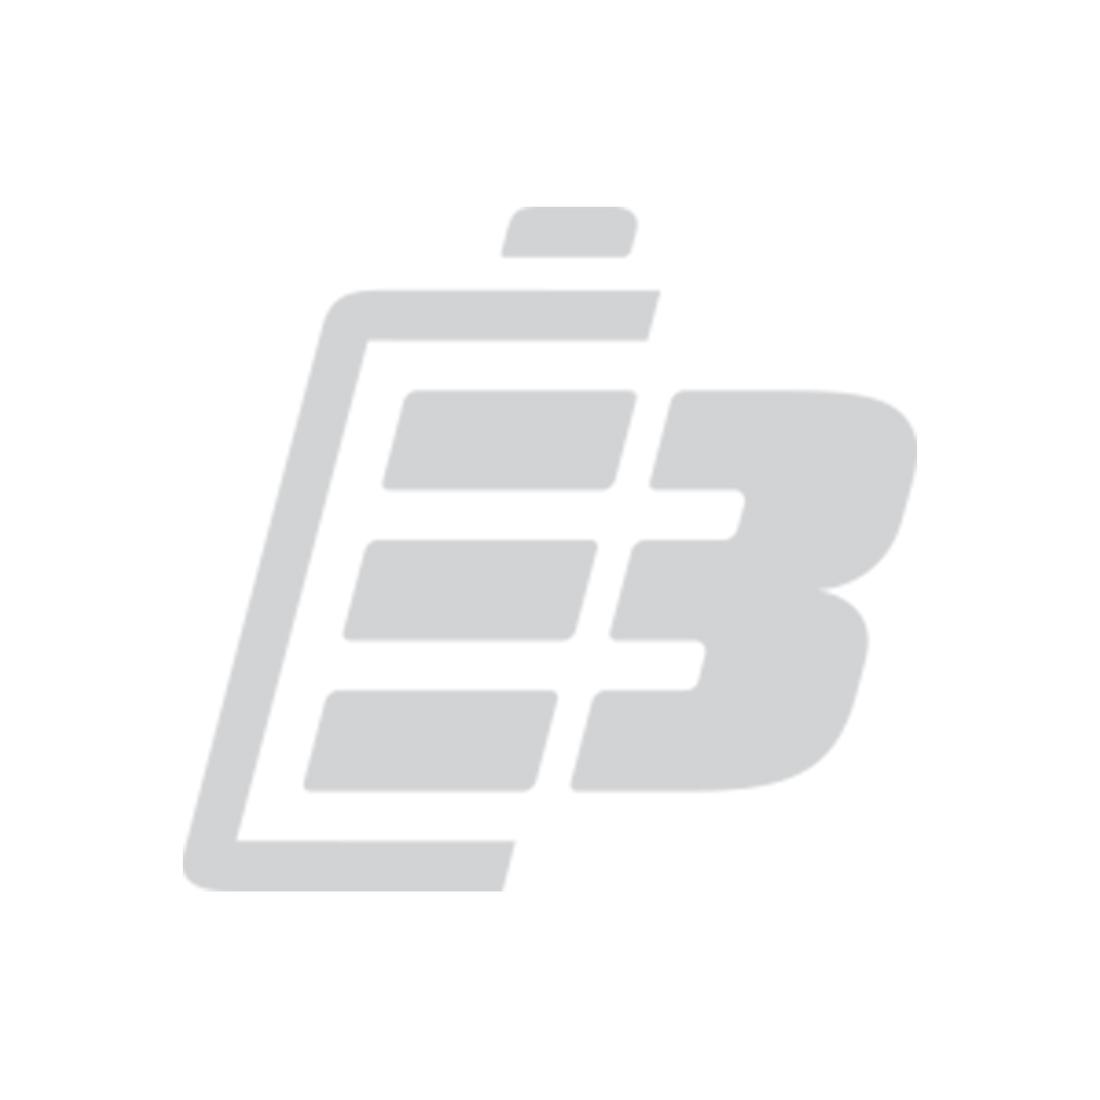 Panasonic NCR18650A battery 18650 3100mah 1